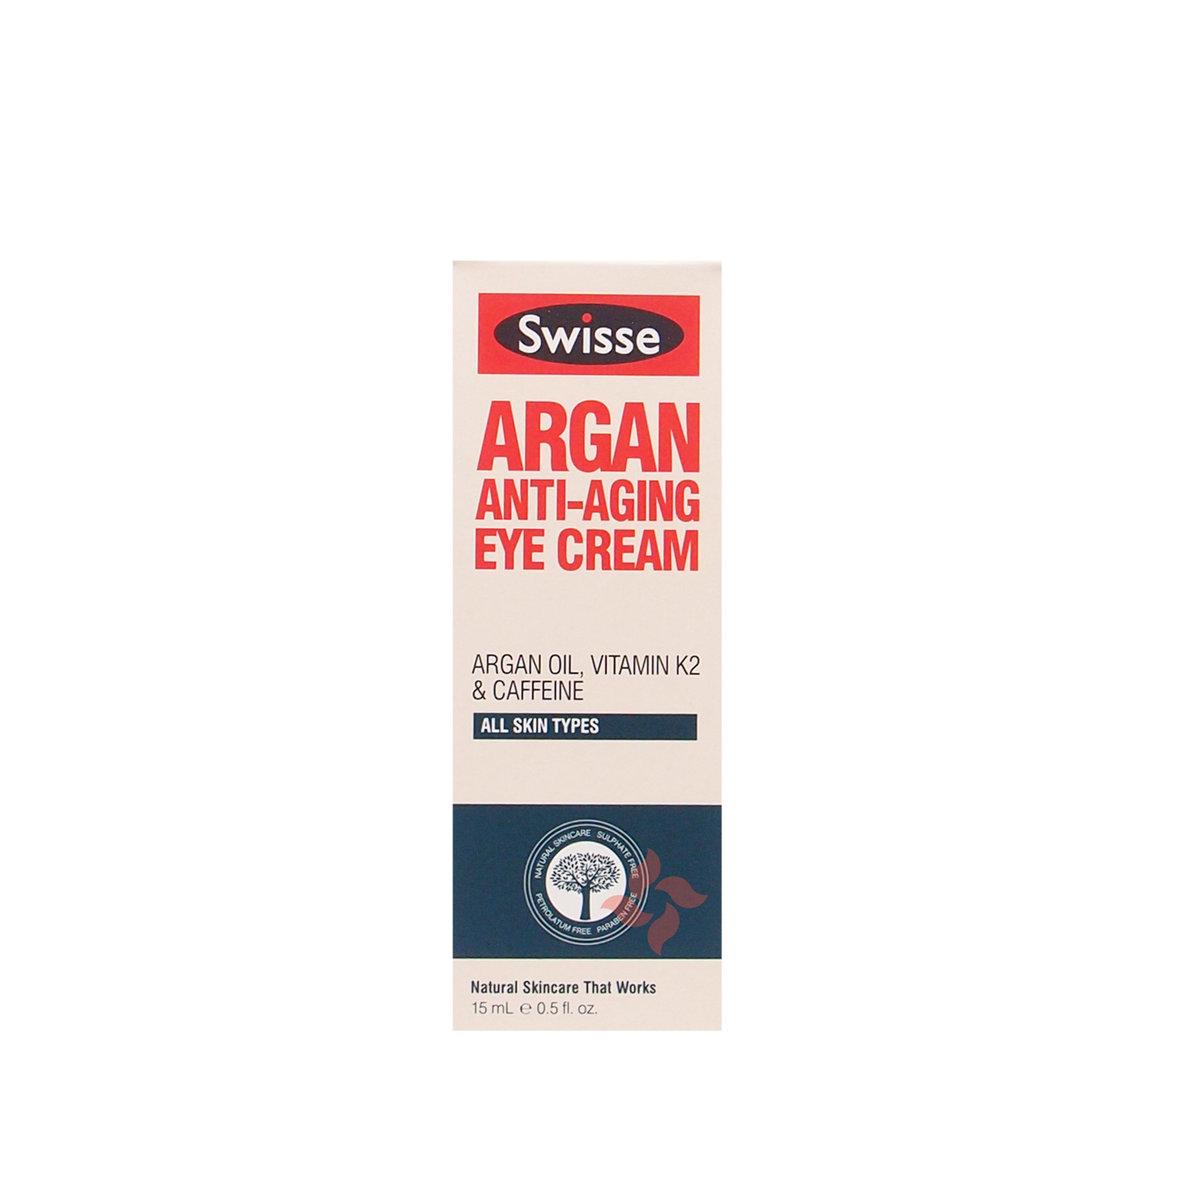 Argan Anti-Aging Eye Cream 15ml (9311770595117)